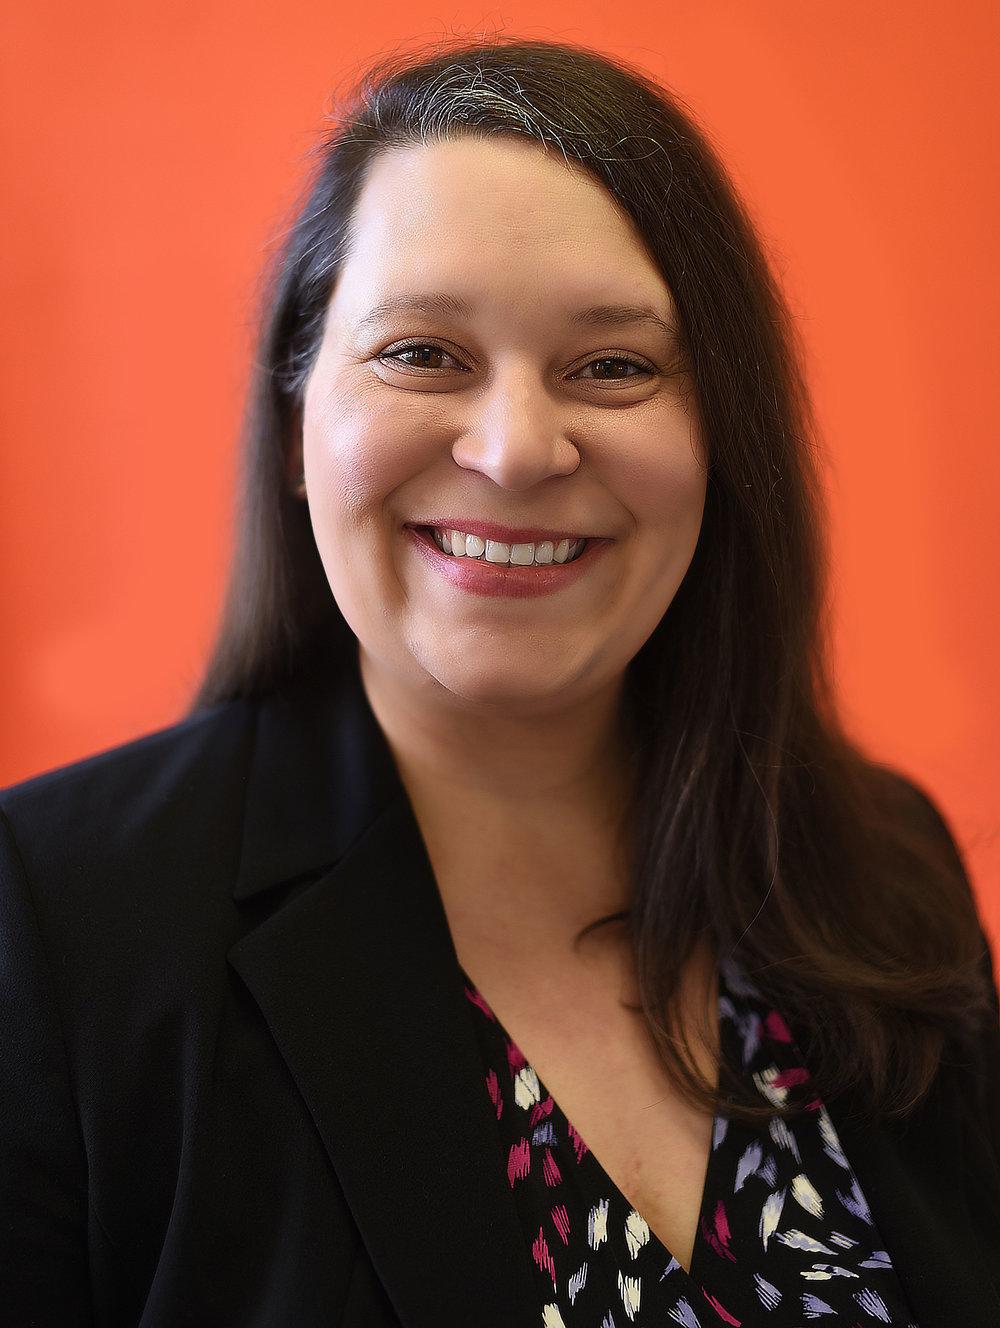 Stephanie Lawson, Principal Consultant and Practice Area Lead, Mavendog, LLC